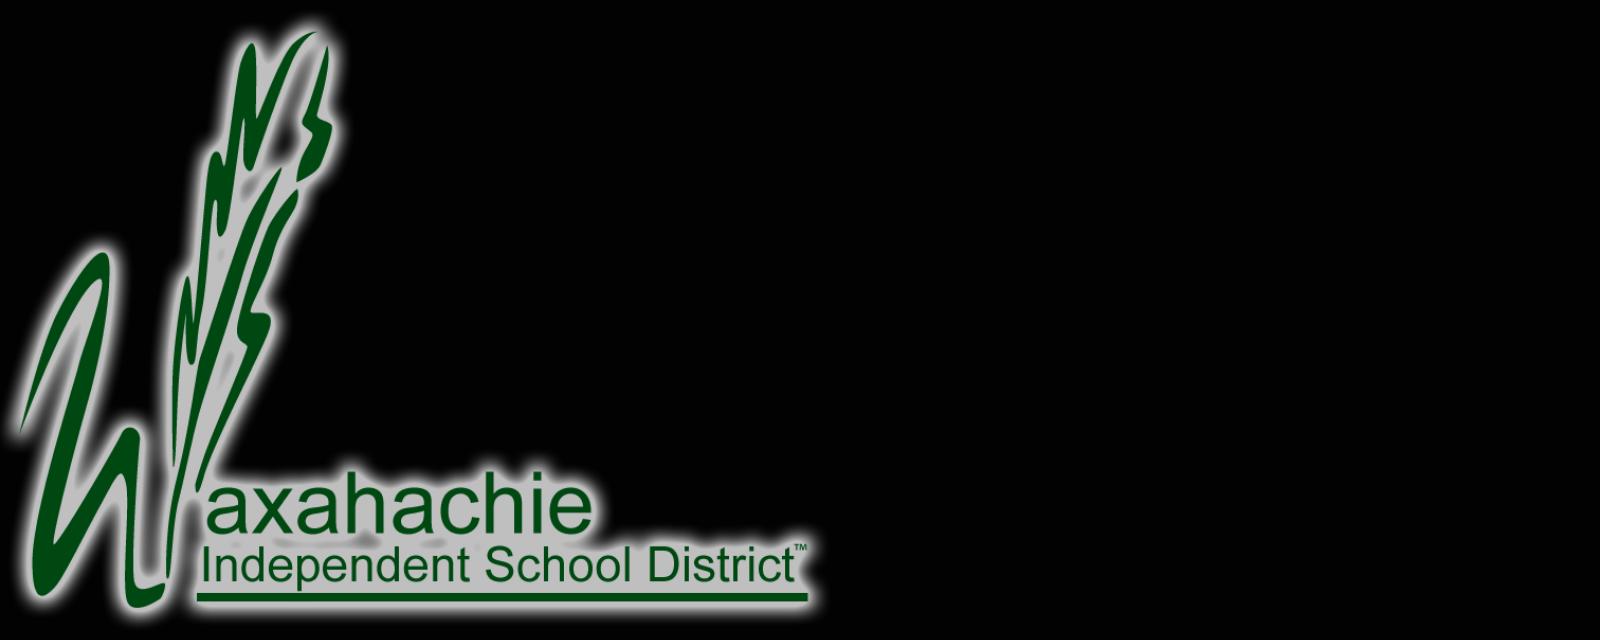 WISD logo on black background